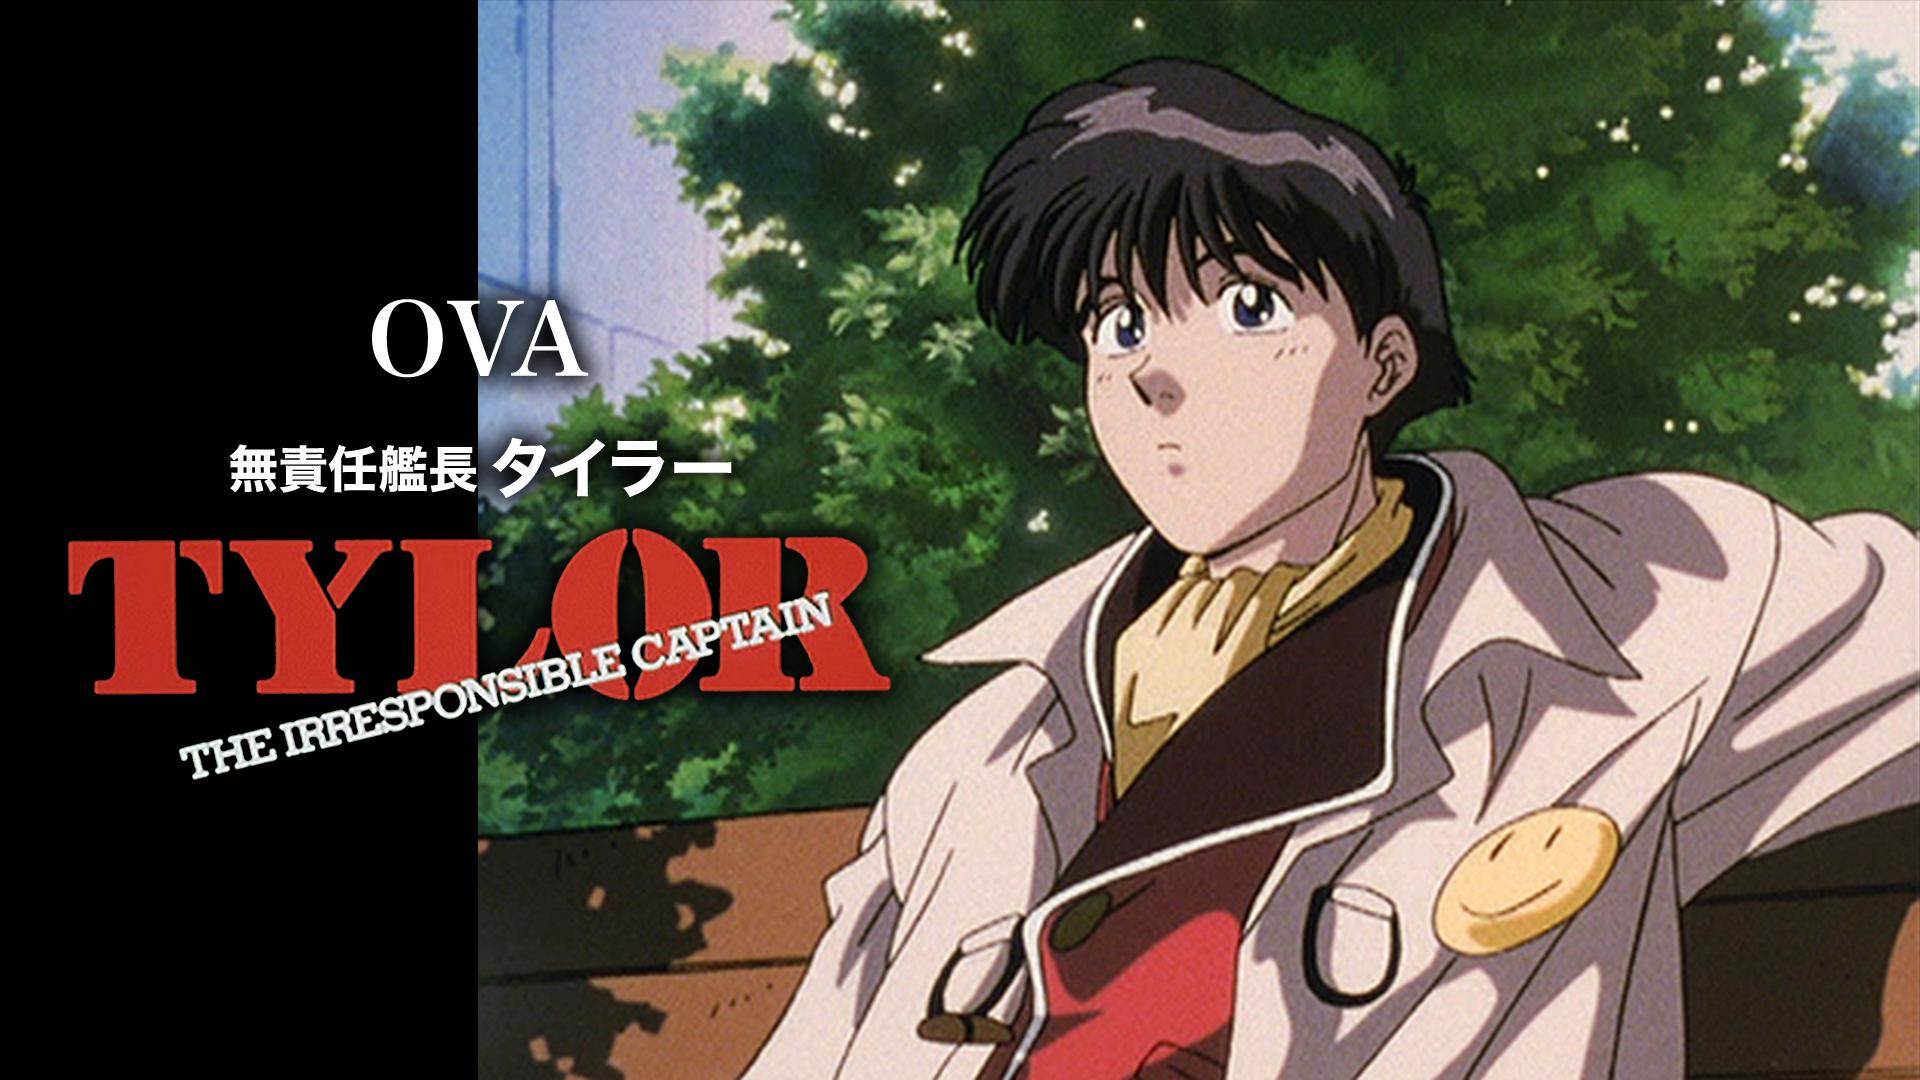 OVA 無責任艦長タイラーの動画 - 無責任ギャラクシー☆タイラー